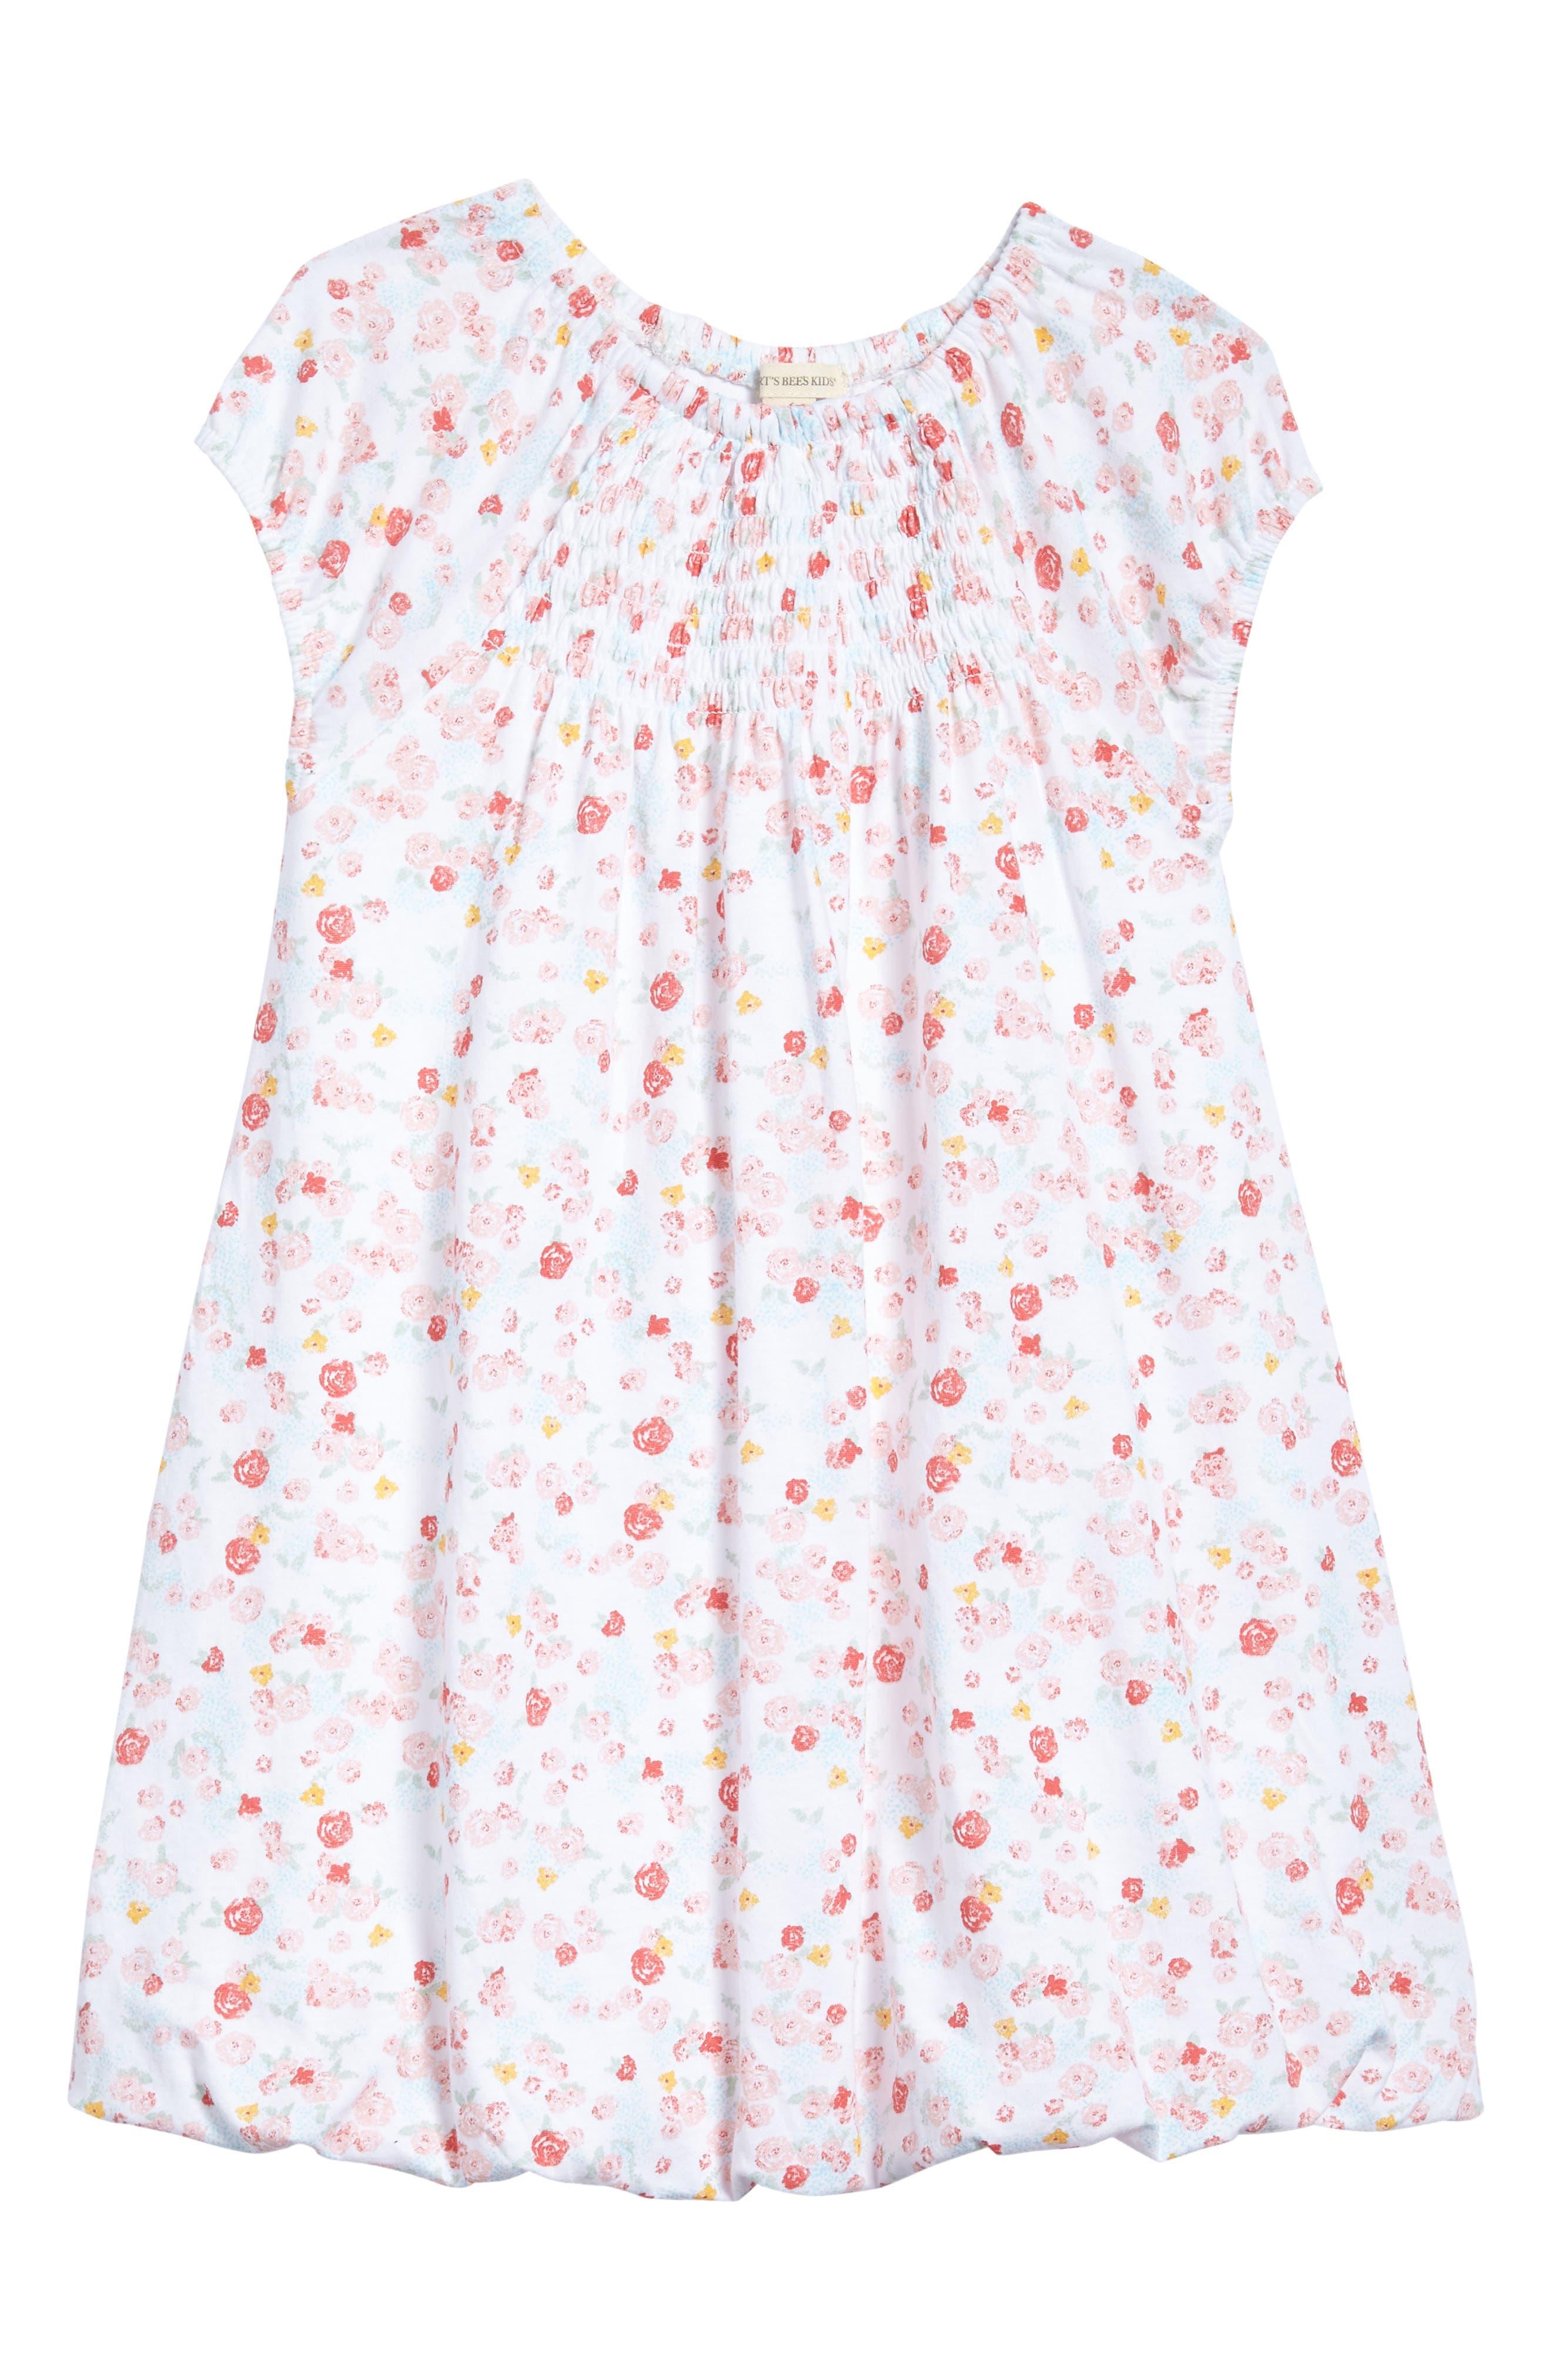 Ditsy Floral Print Bubble Dress,                             Main thumbnail 1, color,                             100